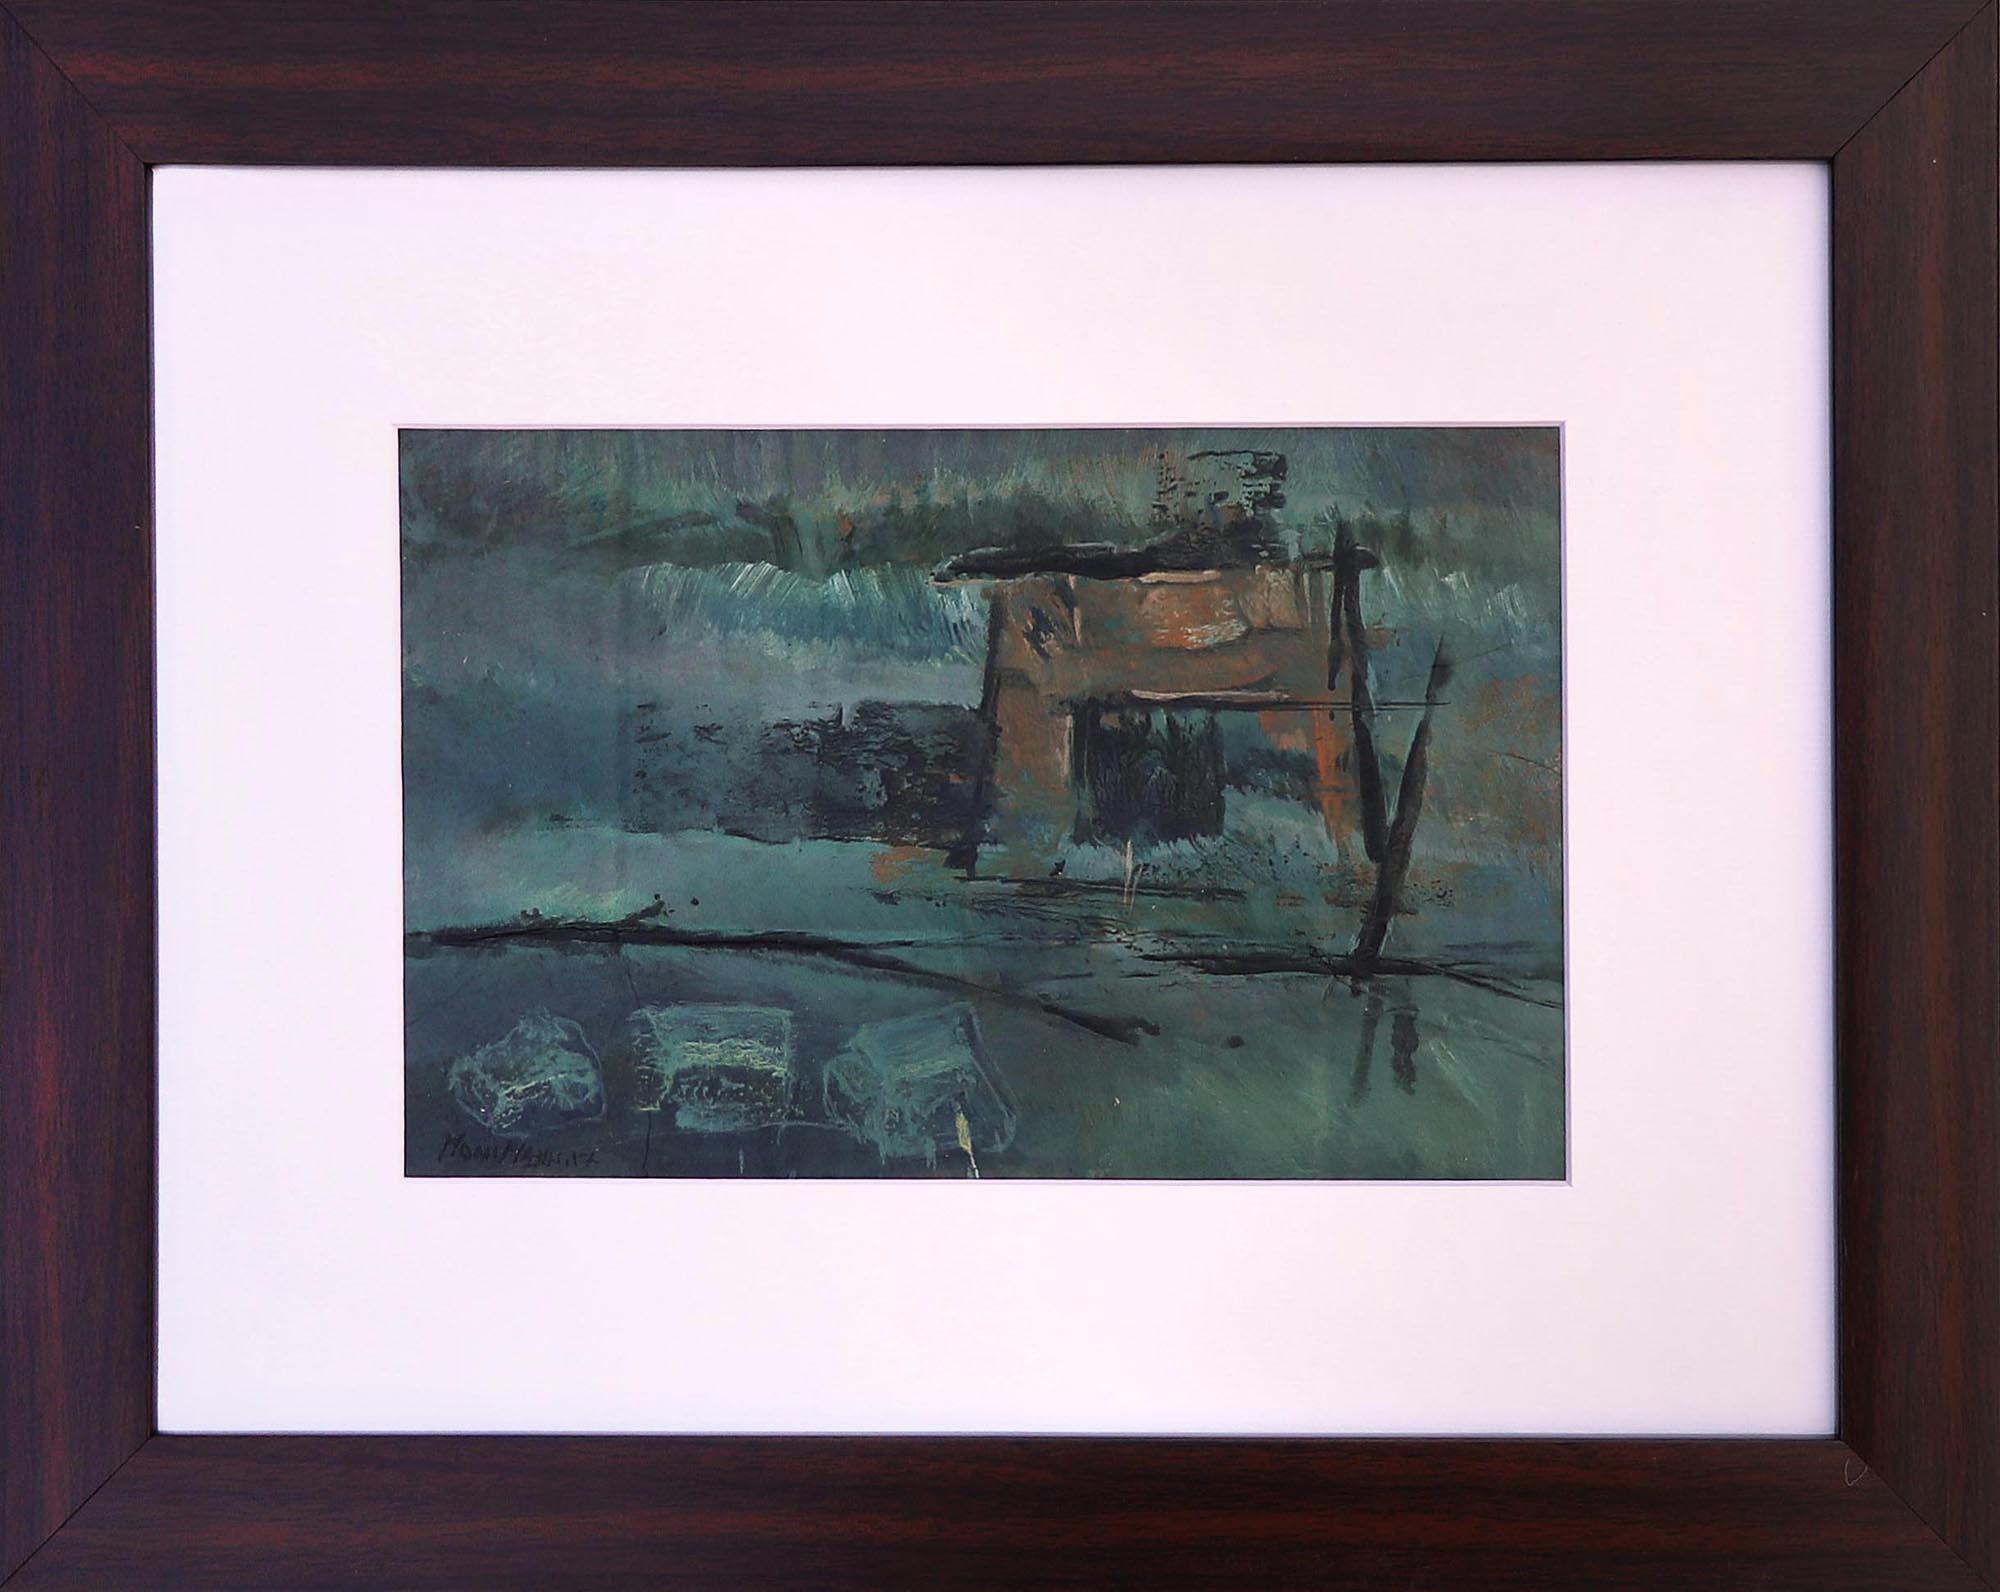 Moinuddin Moni, Sohra 1, Acrylic on paper, 30 x 38 cm with frame, 2017